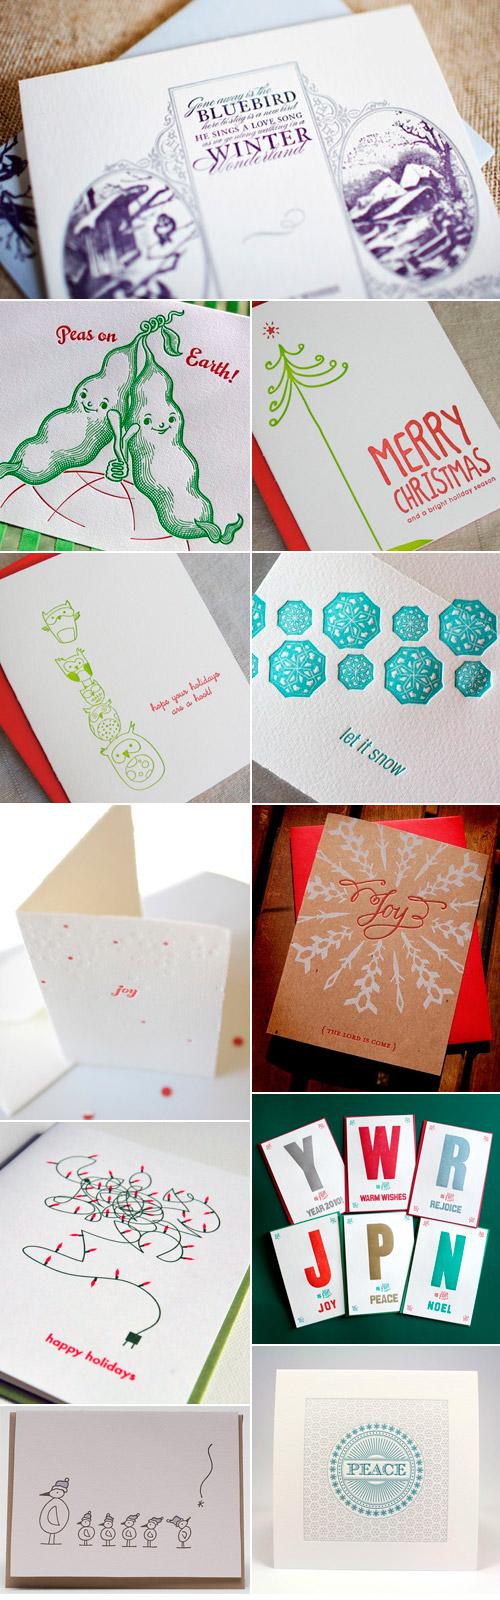 A Letterpress Christmas 2009